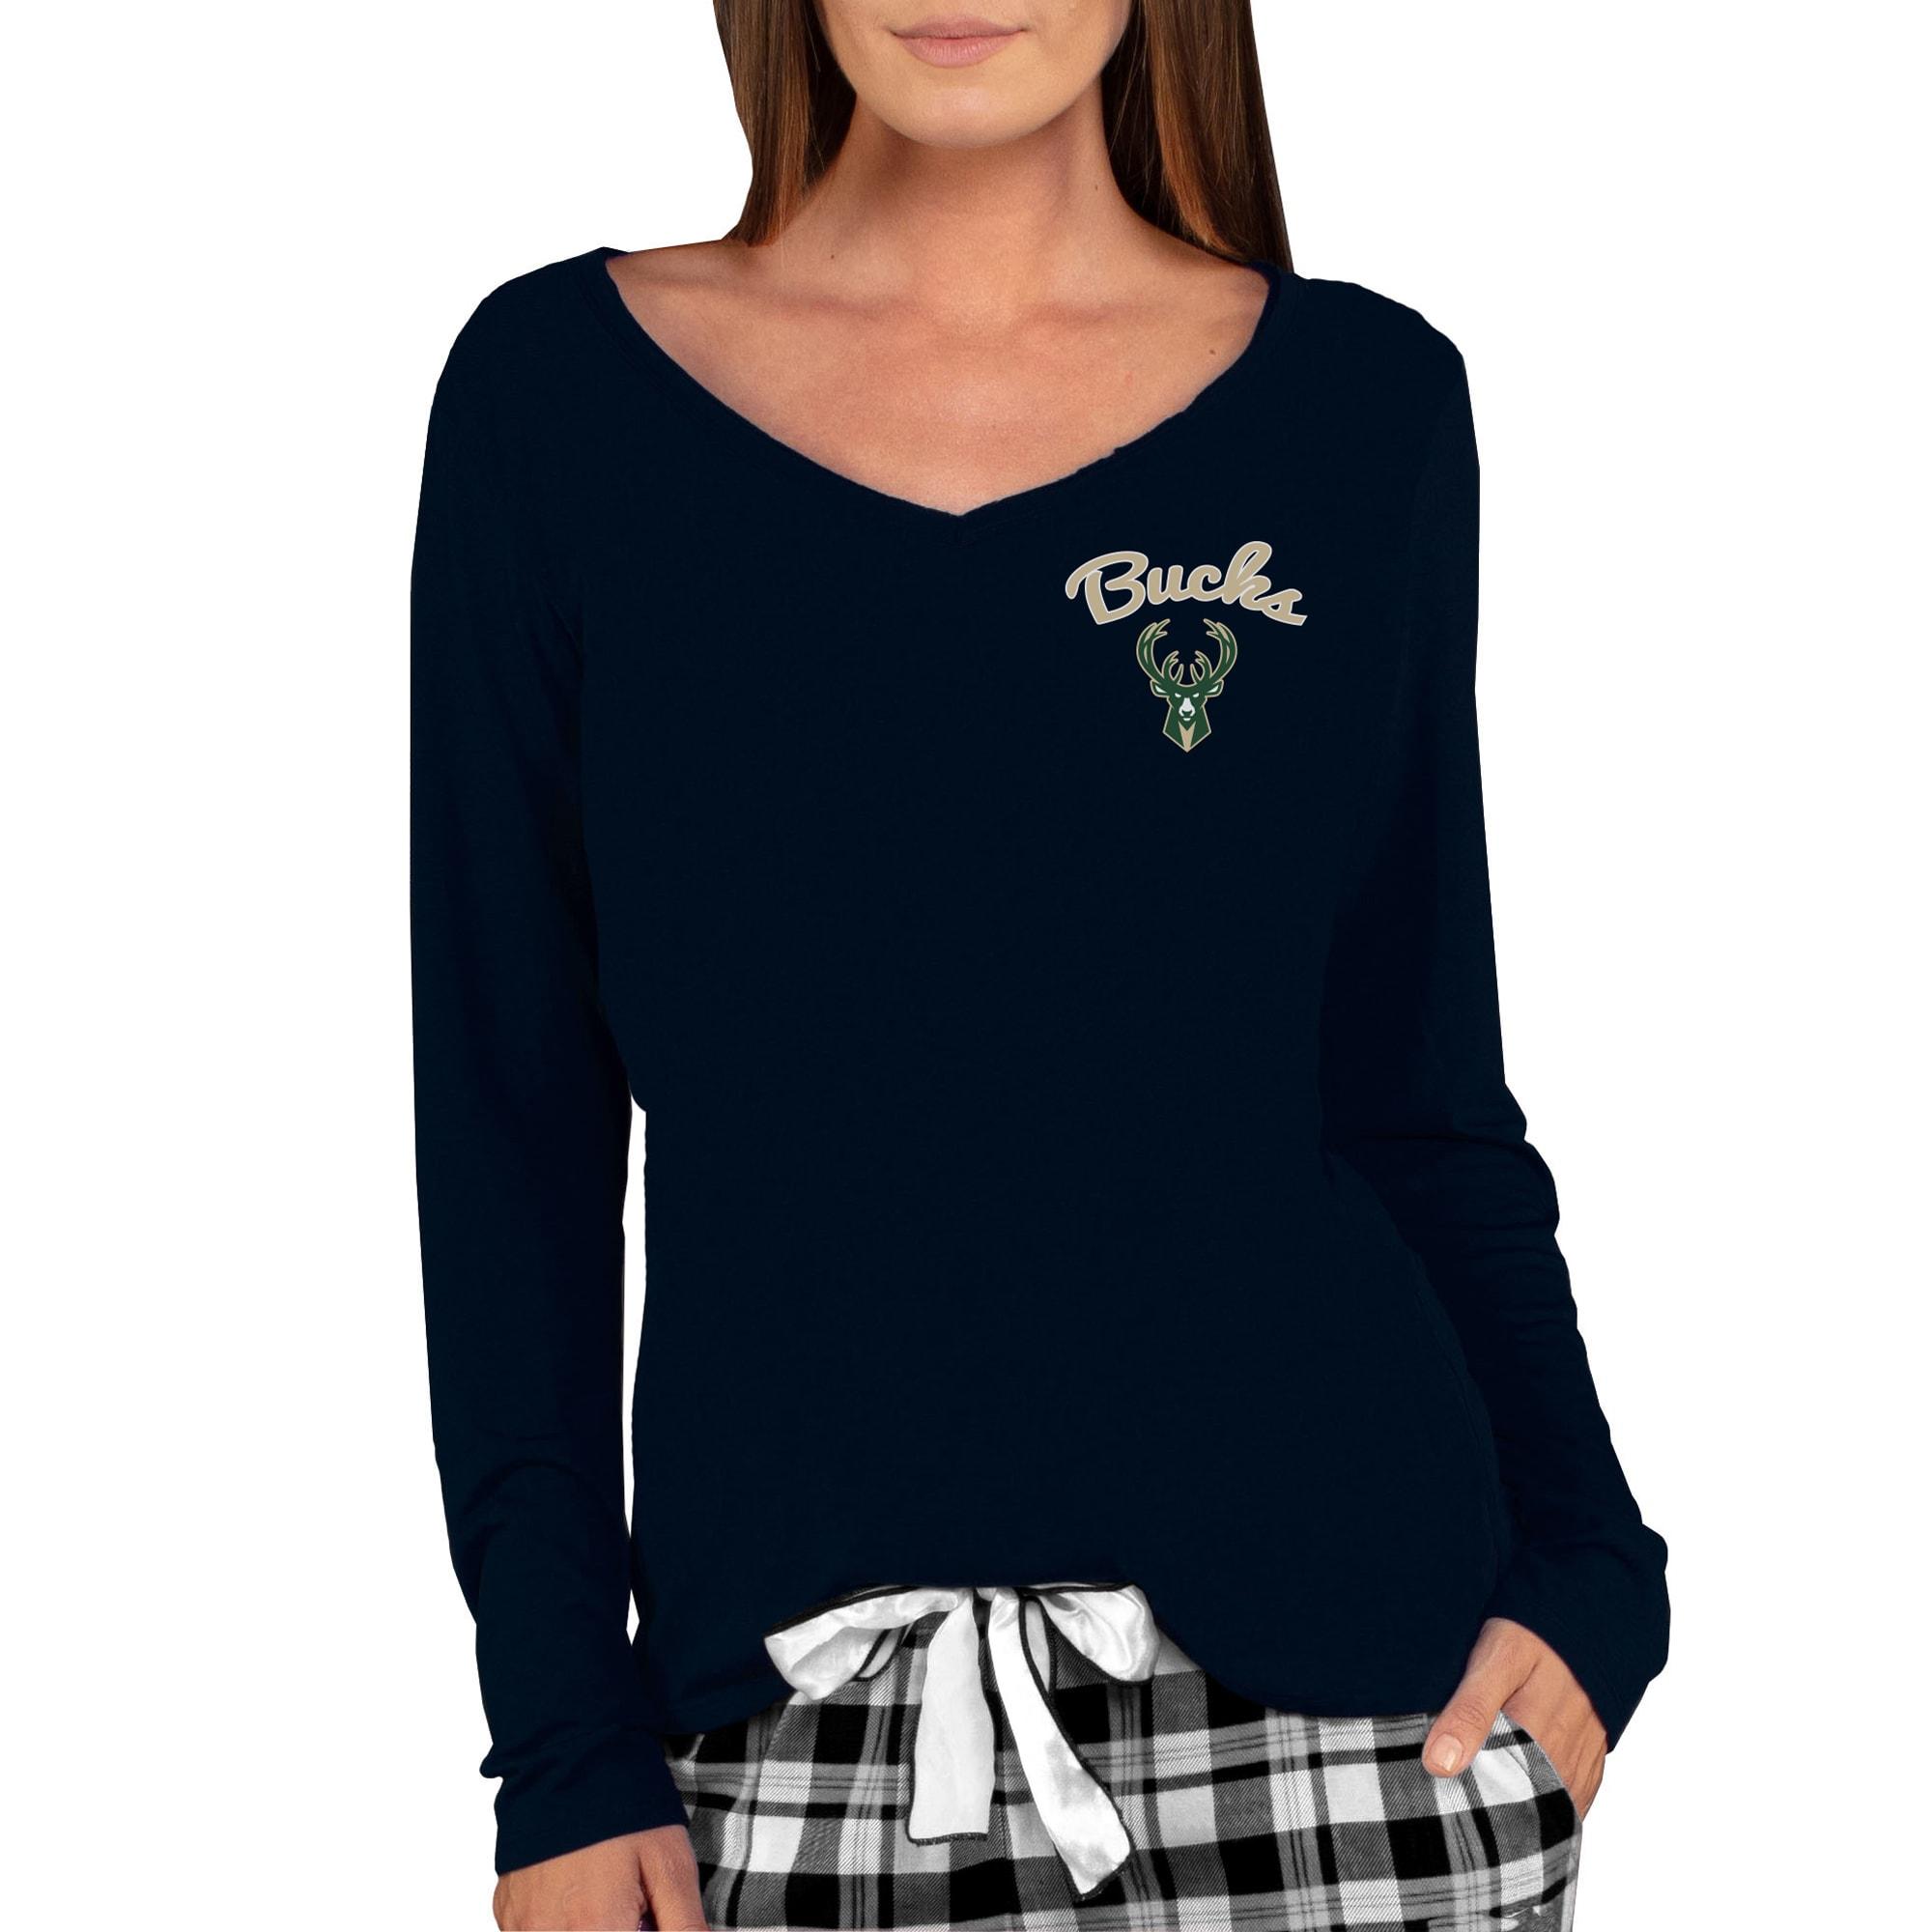 Milwaukee Bucks Concepts Sport Women's Marathon V-Neck Long Sleeve T-Shirt - Black